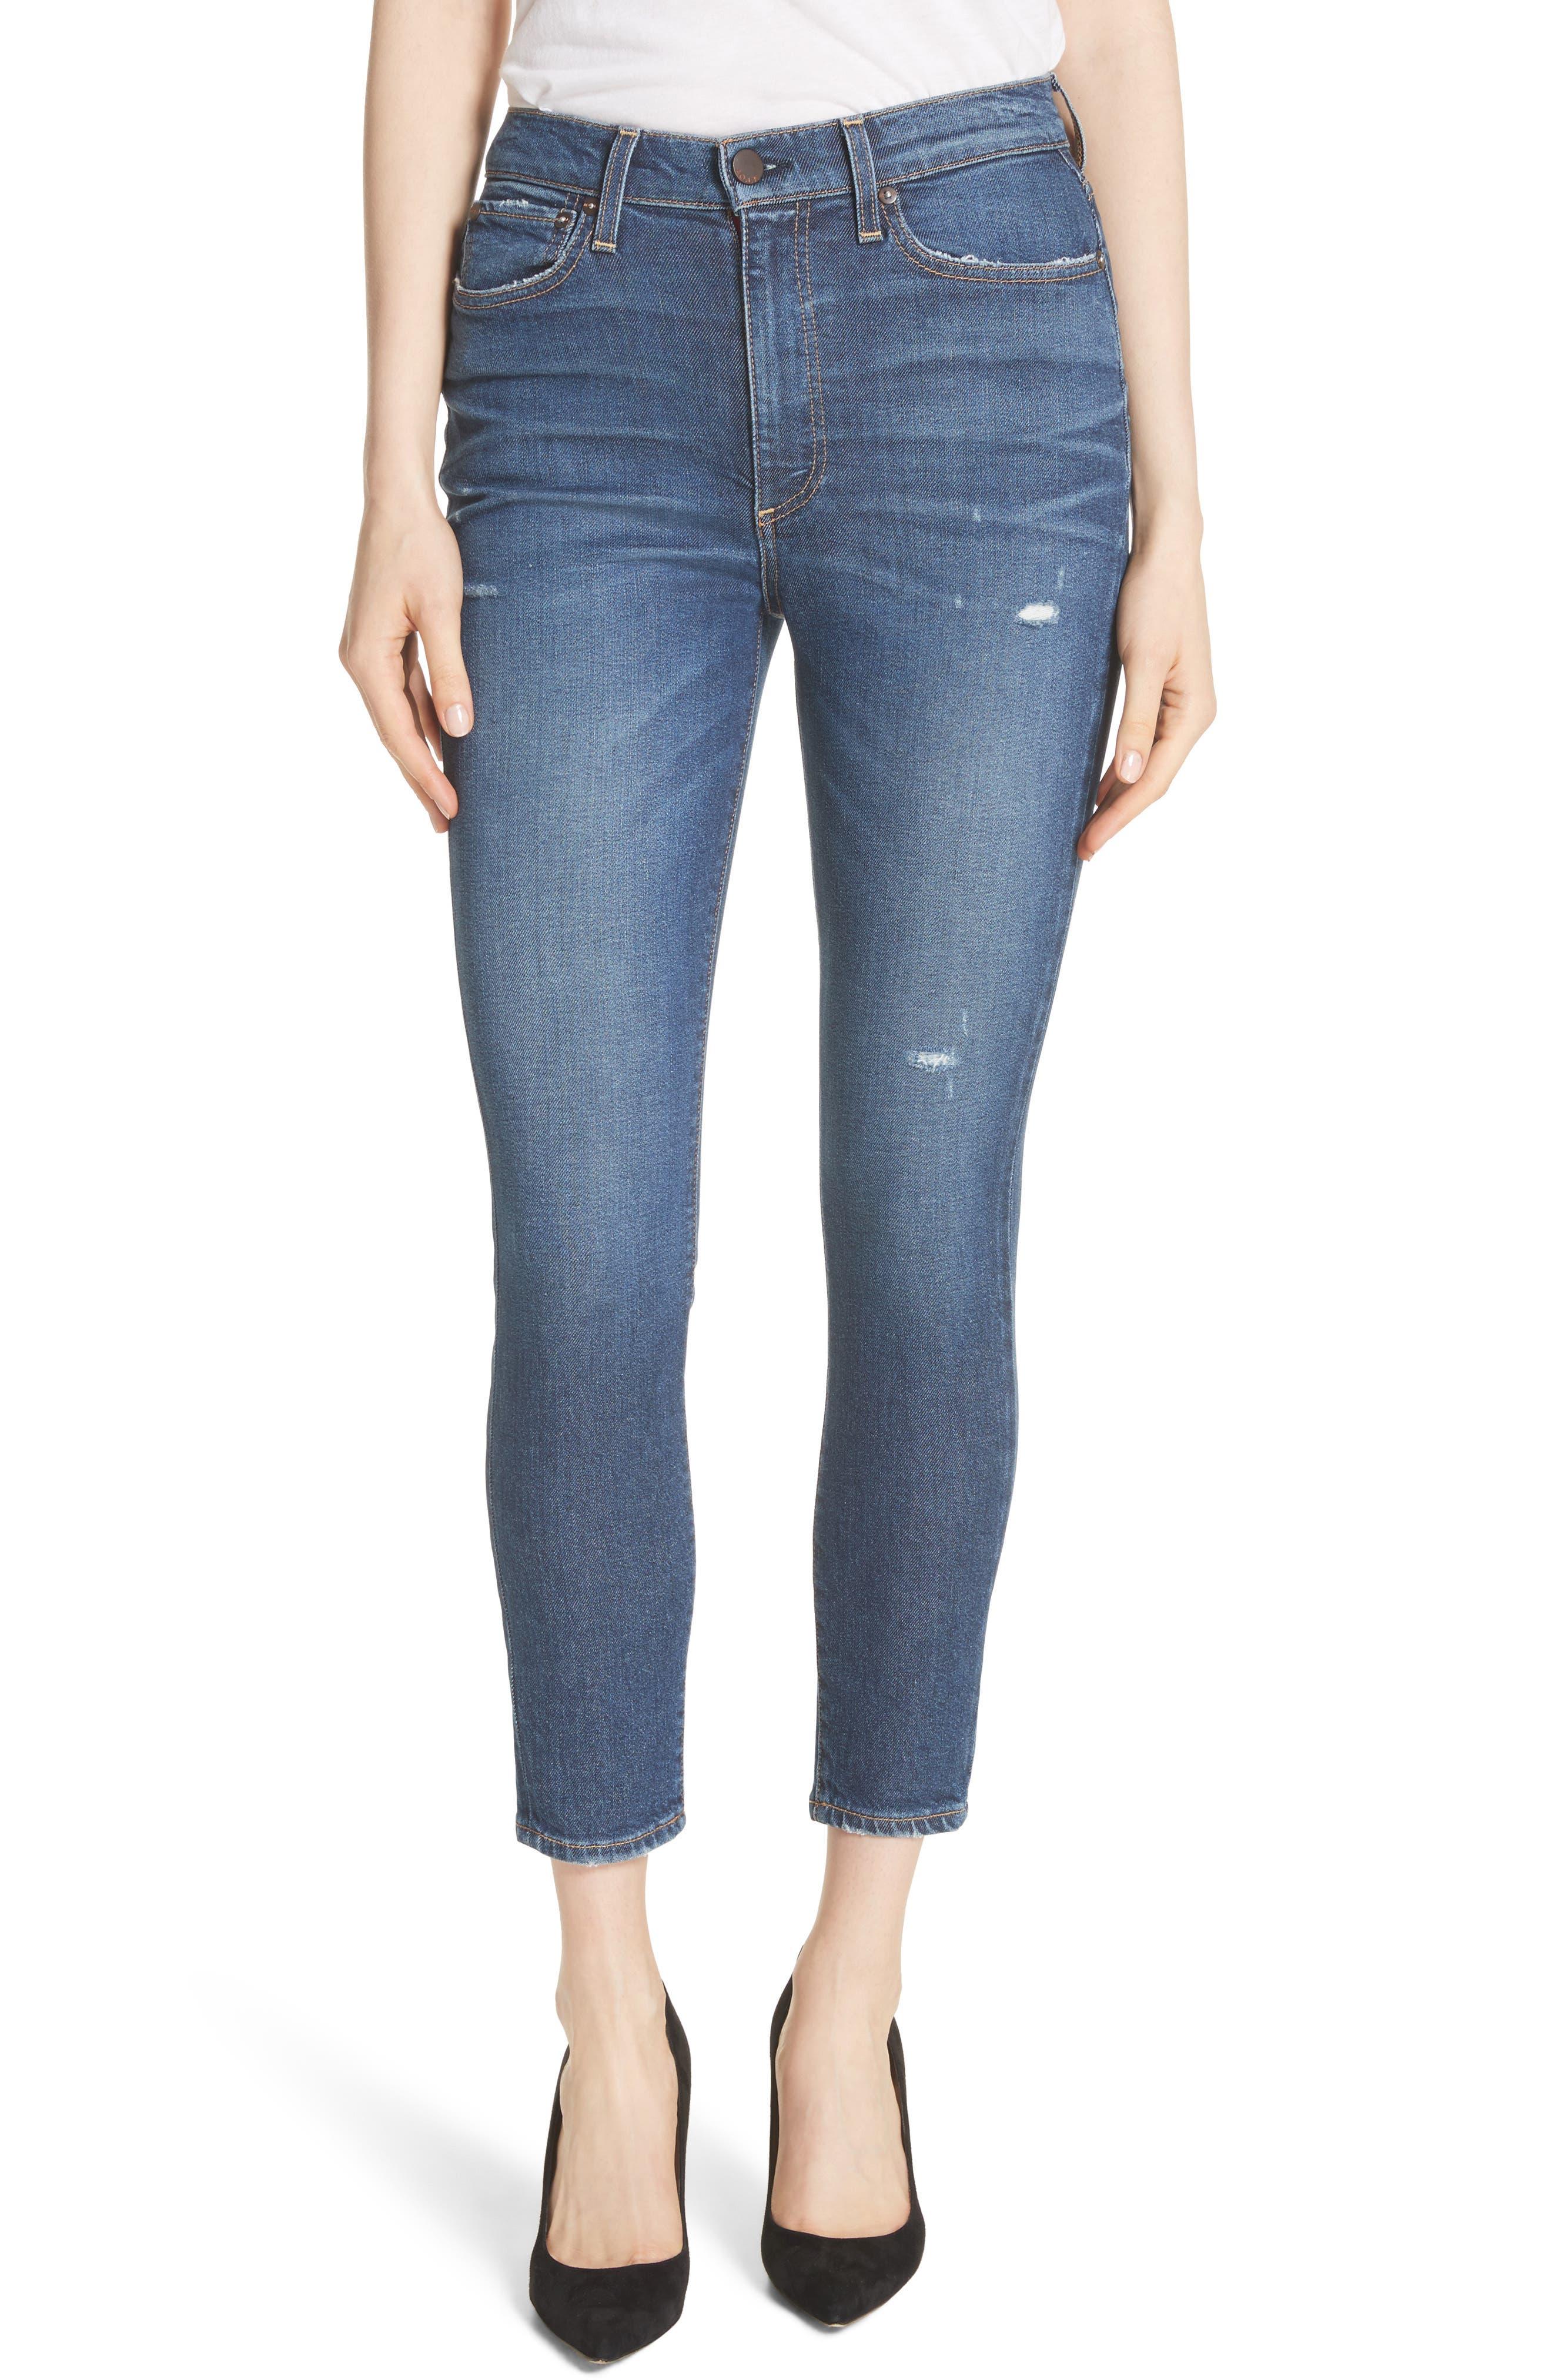 AO.LA Good High Waist Ankle Skinny Jeans,                         Main,                         color, Born To Run